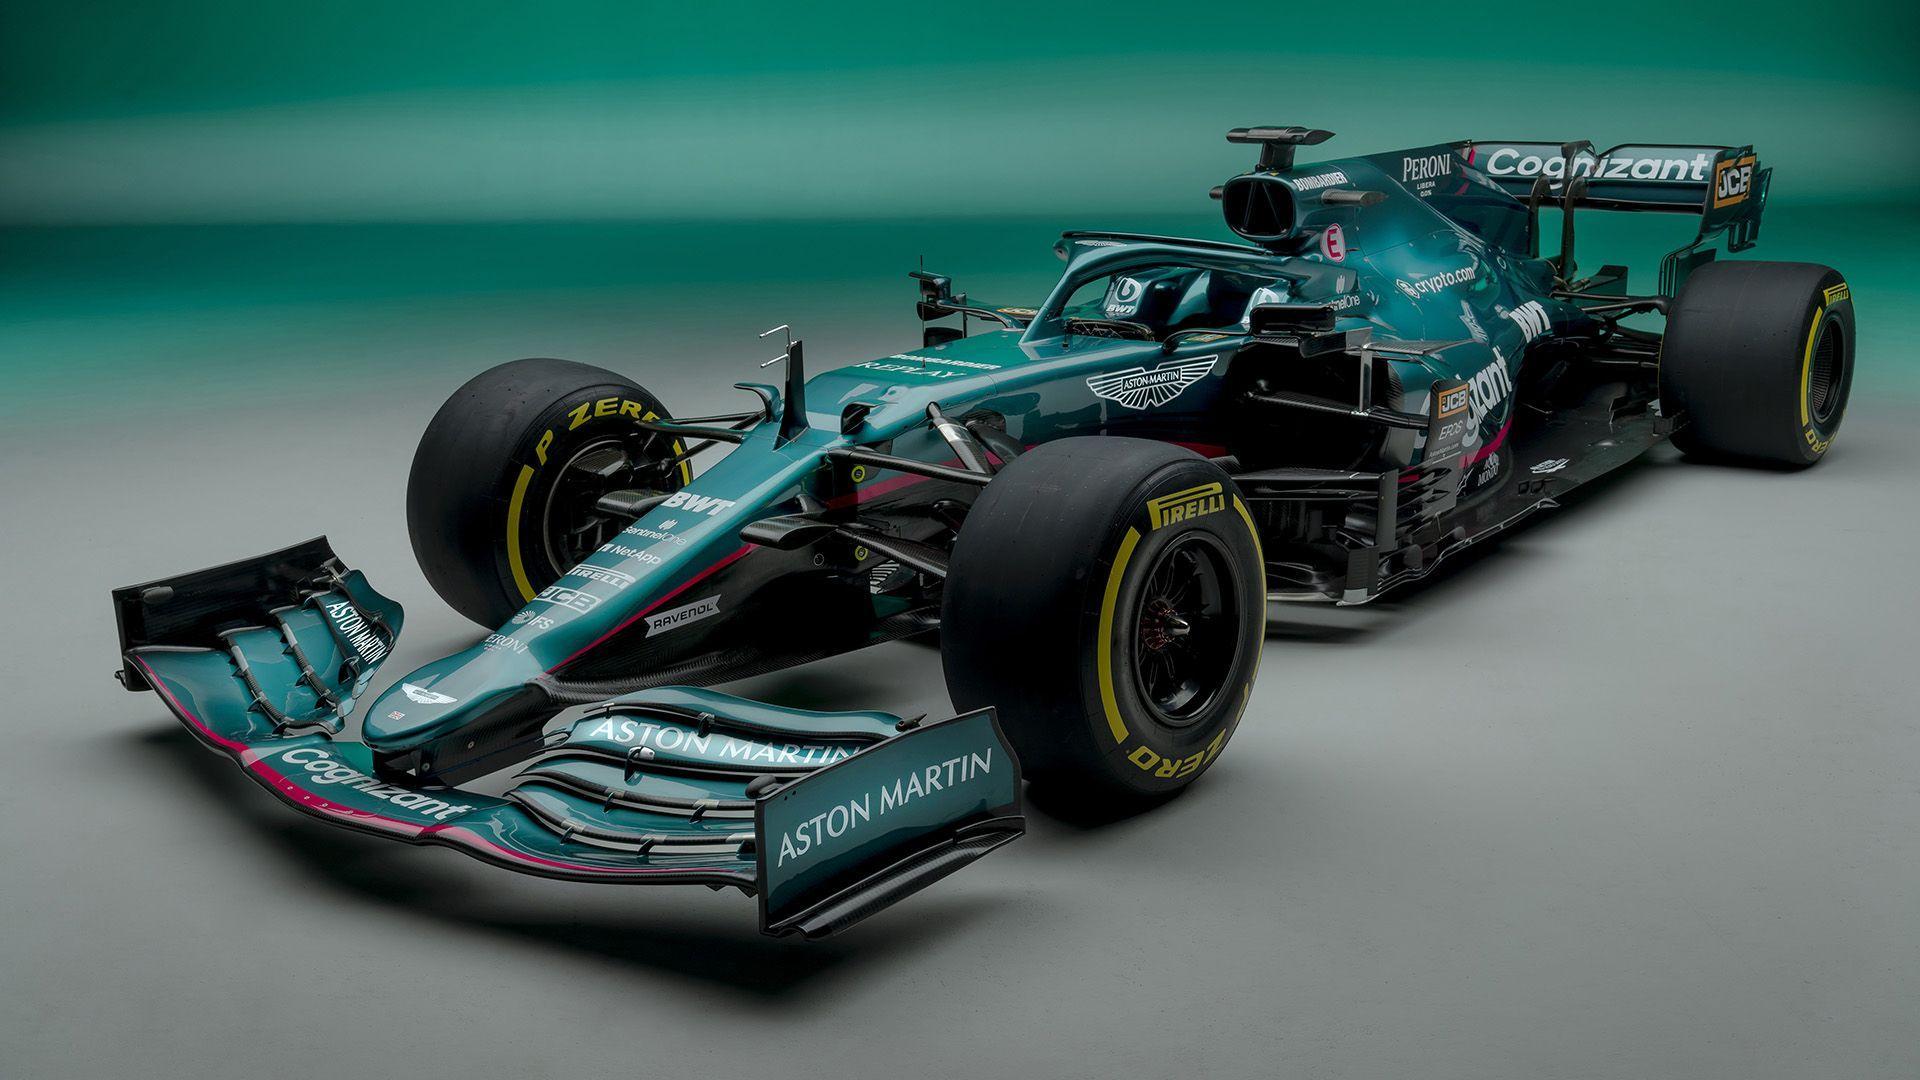 Aston Martin Cognizant F1 Team Teams Background 2